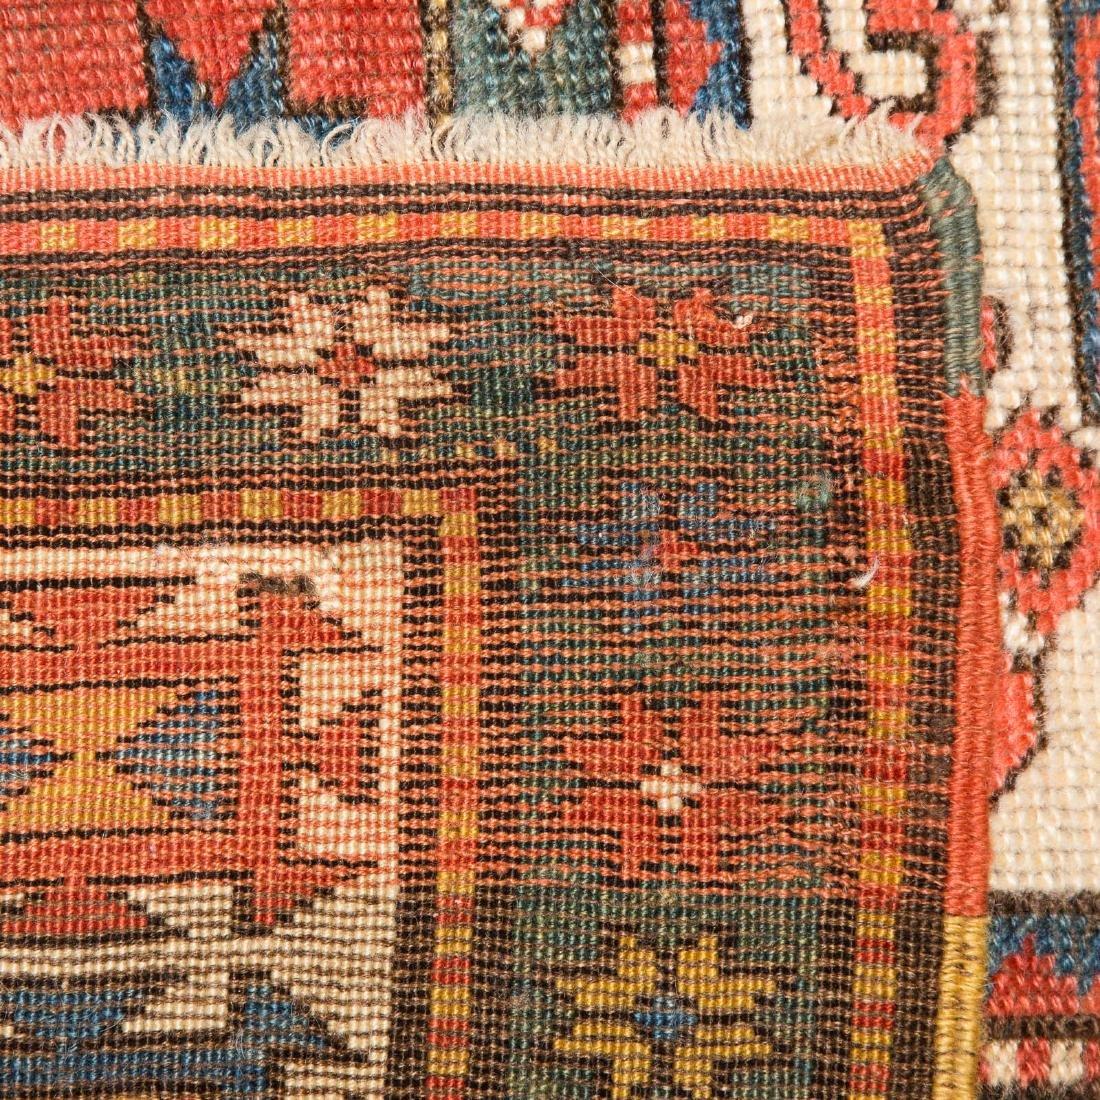 Antique Kazak rug, approx. 3.9 x 5.4 - 3